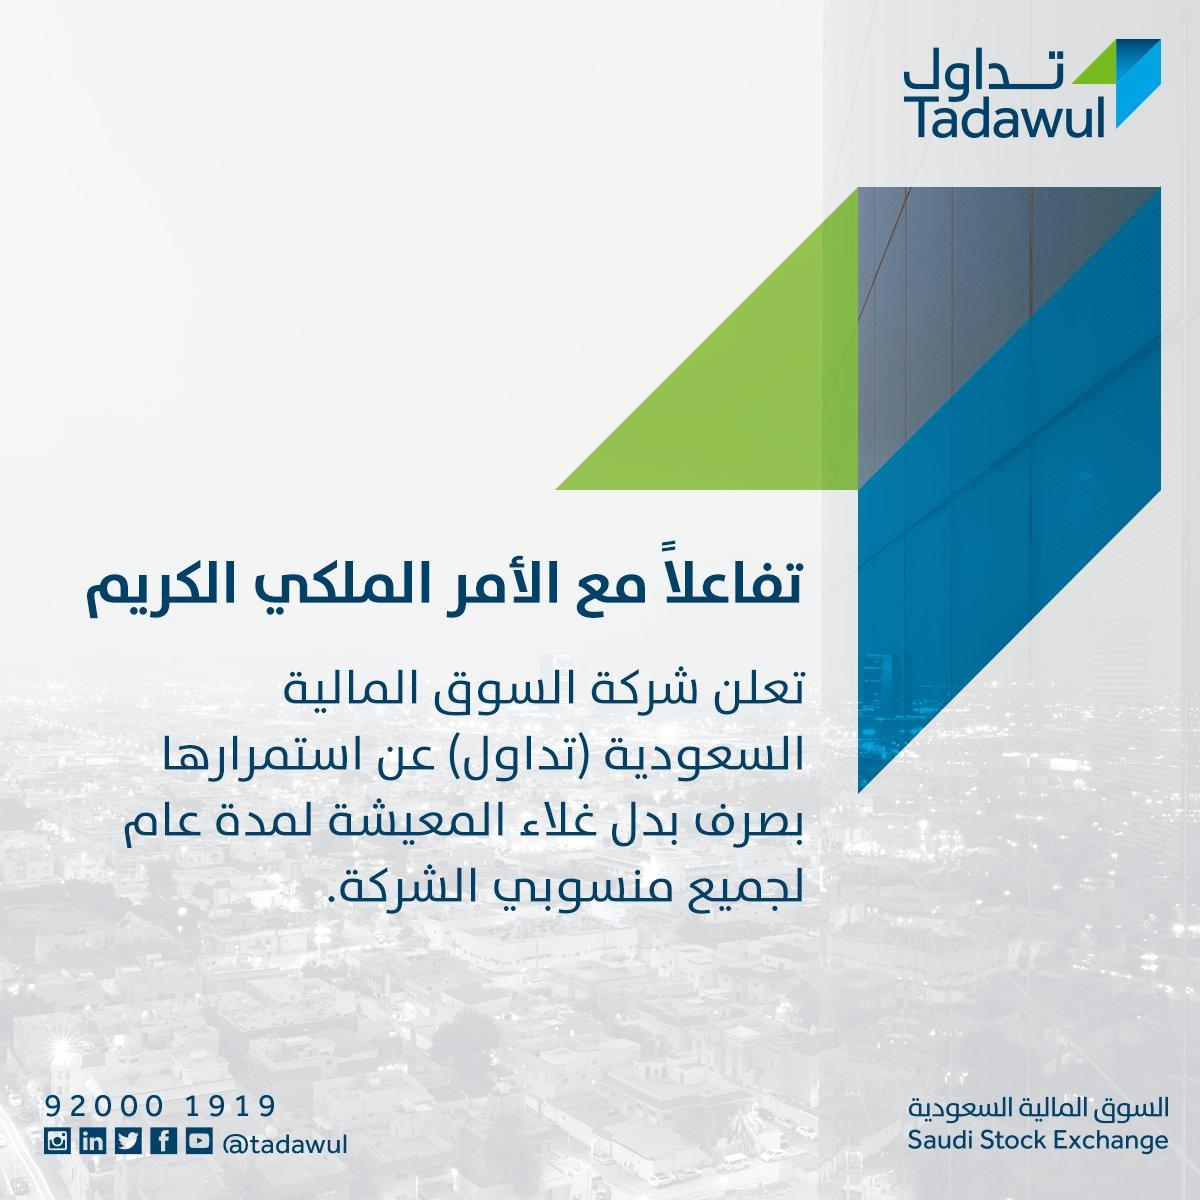 e2194ab5f Tadawul | تداول on Twitter: